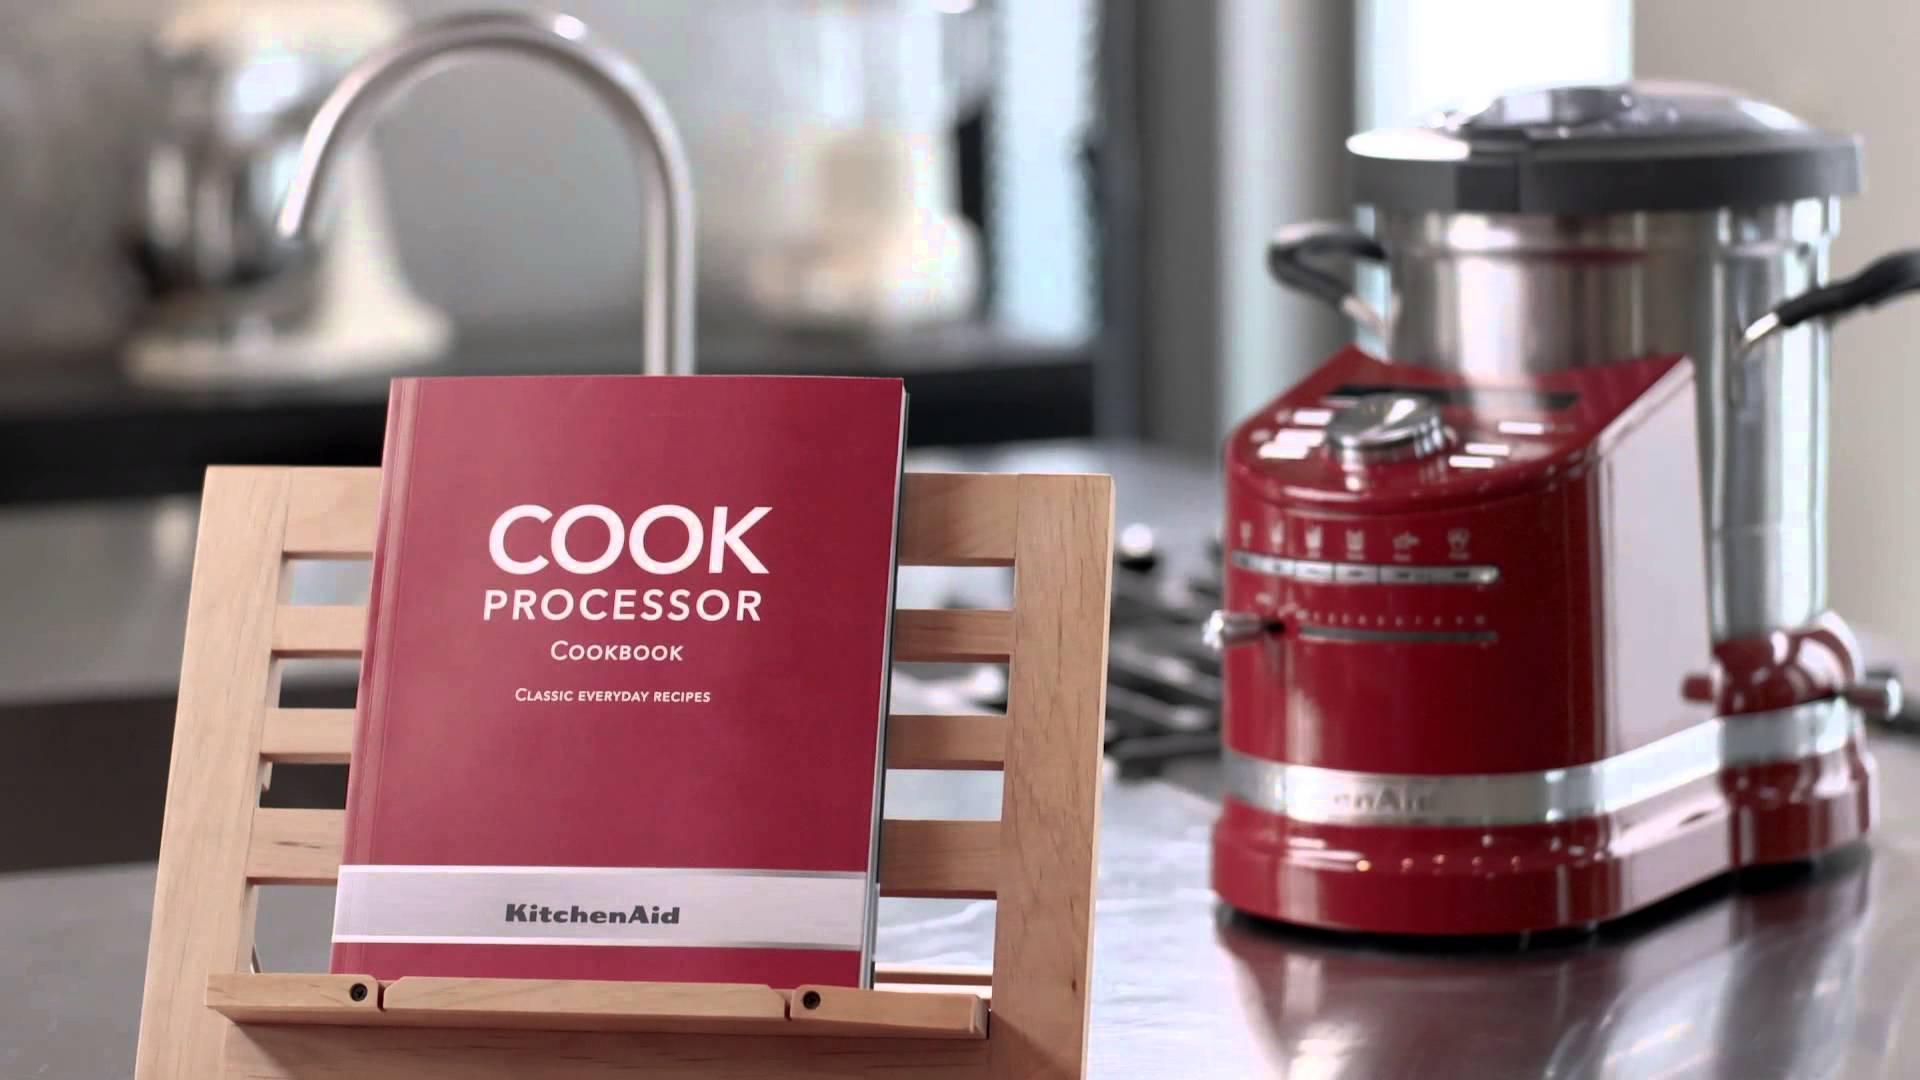 Multifunctioneel keukenapparaat KitchenAid Cookprocessor